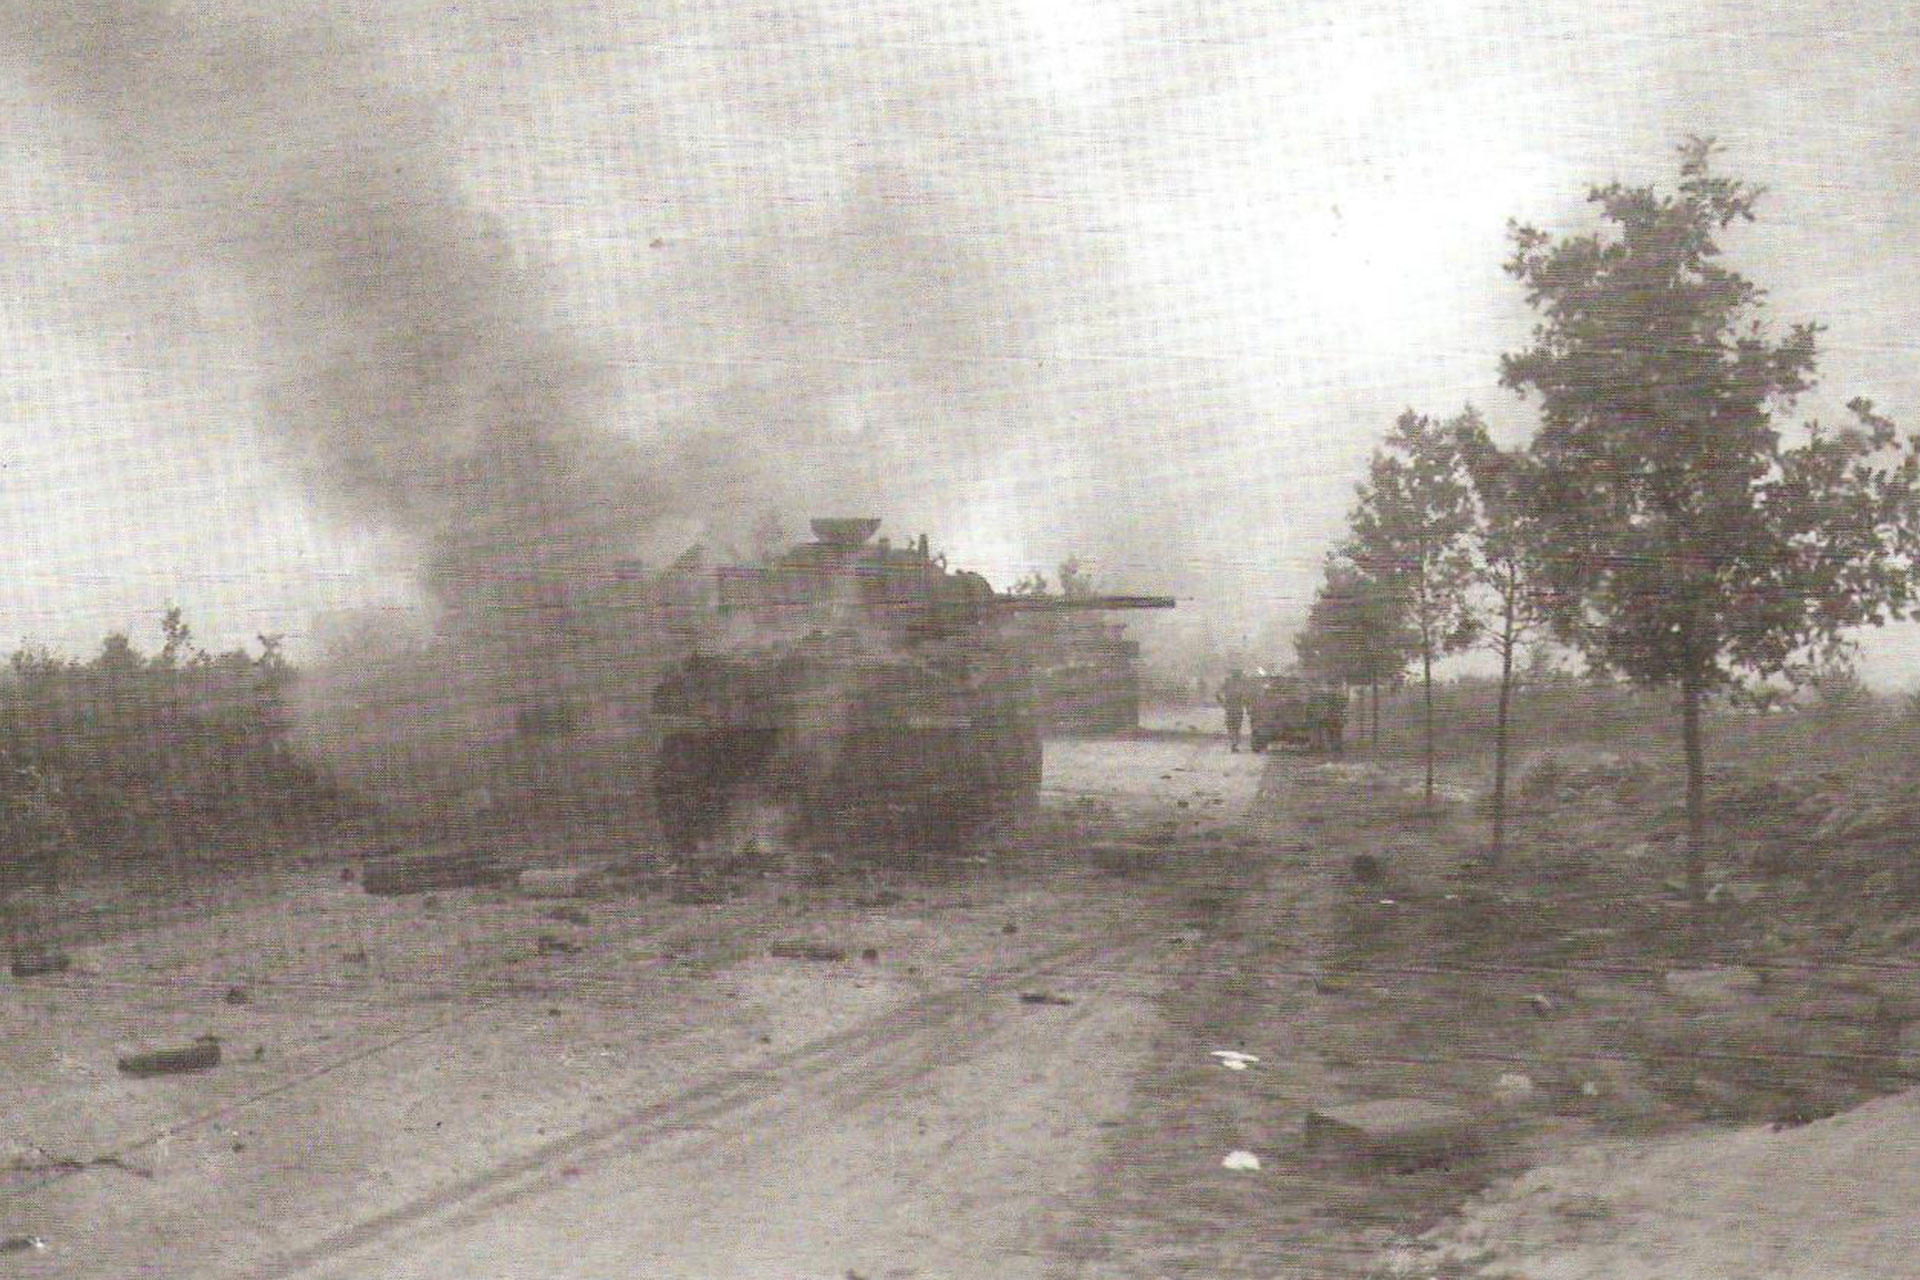 The anti-tank ambush on the Valkensvaard road in September 1944